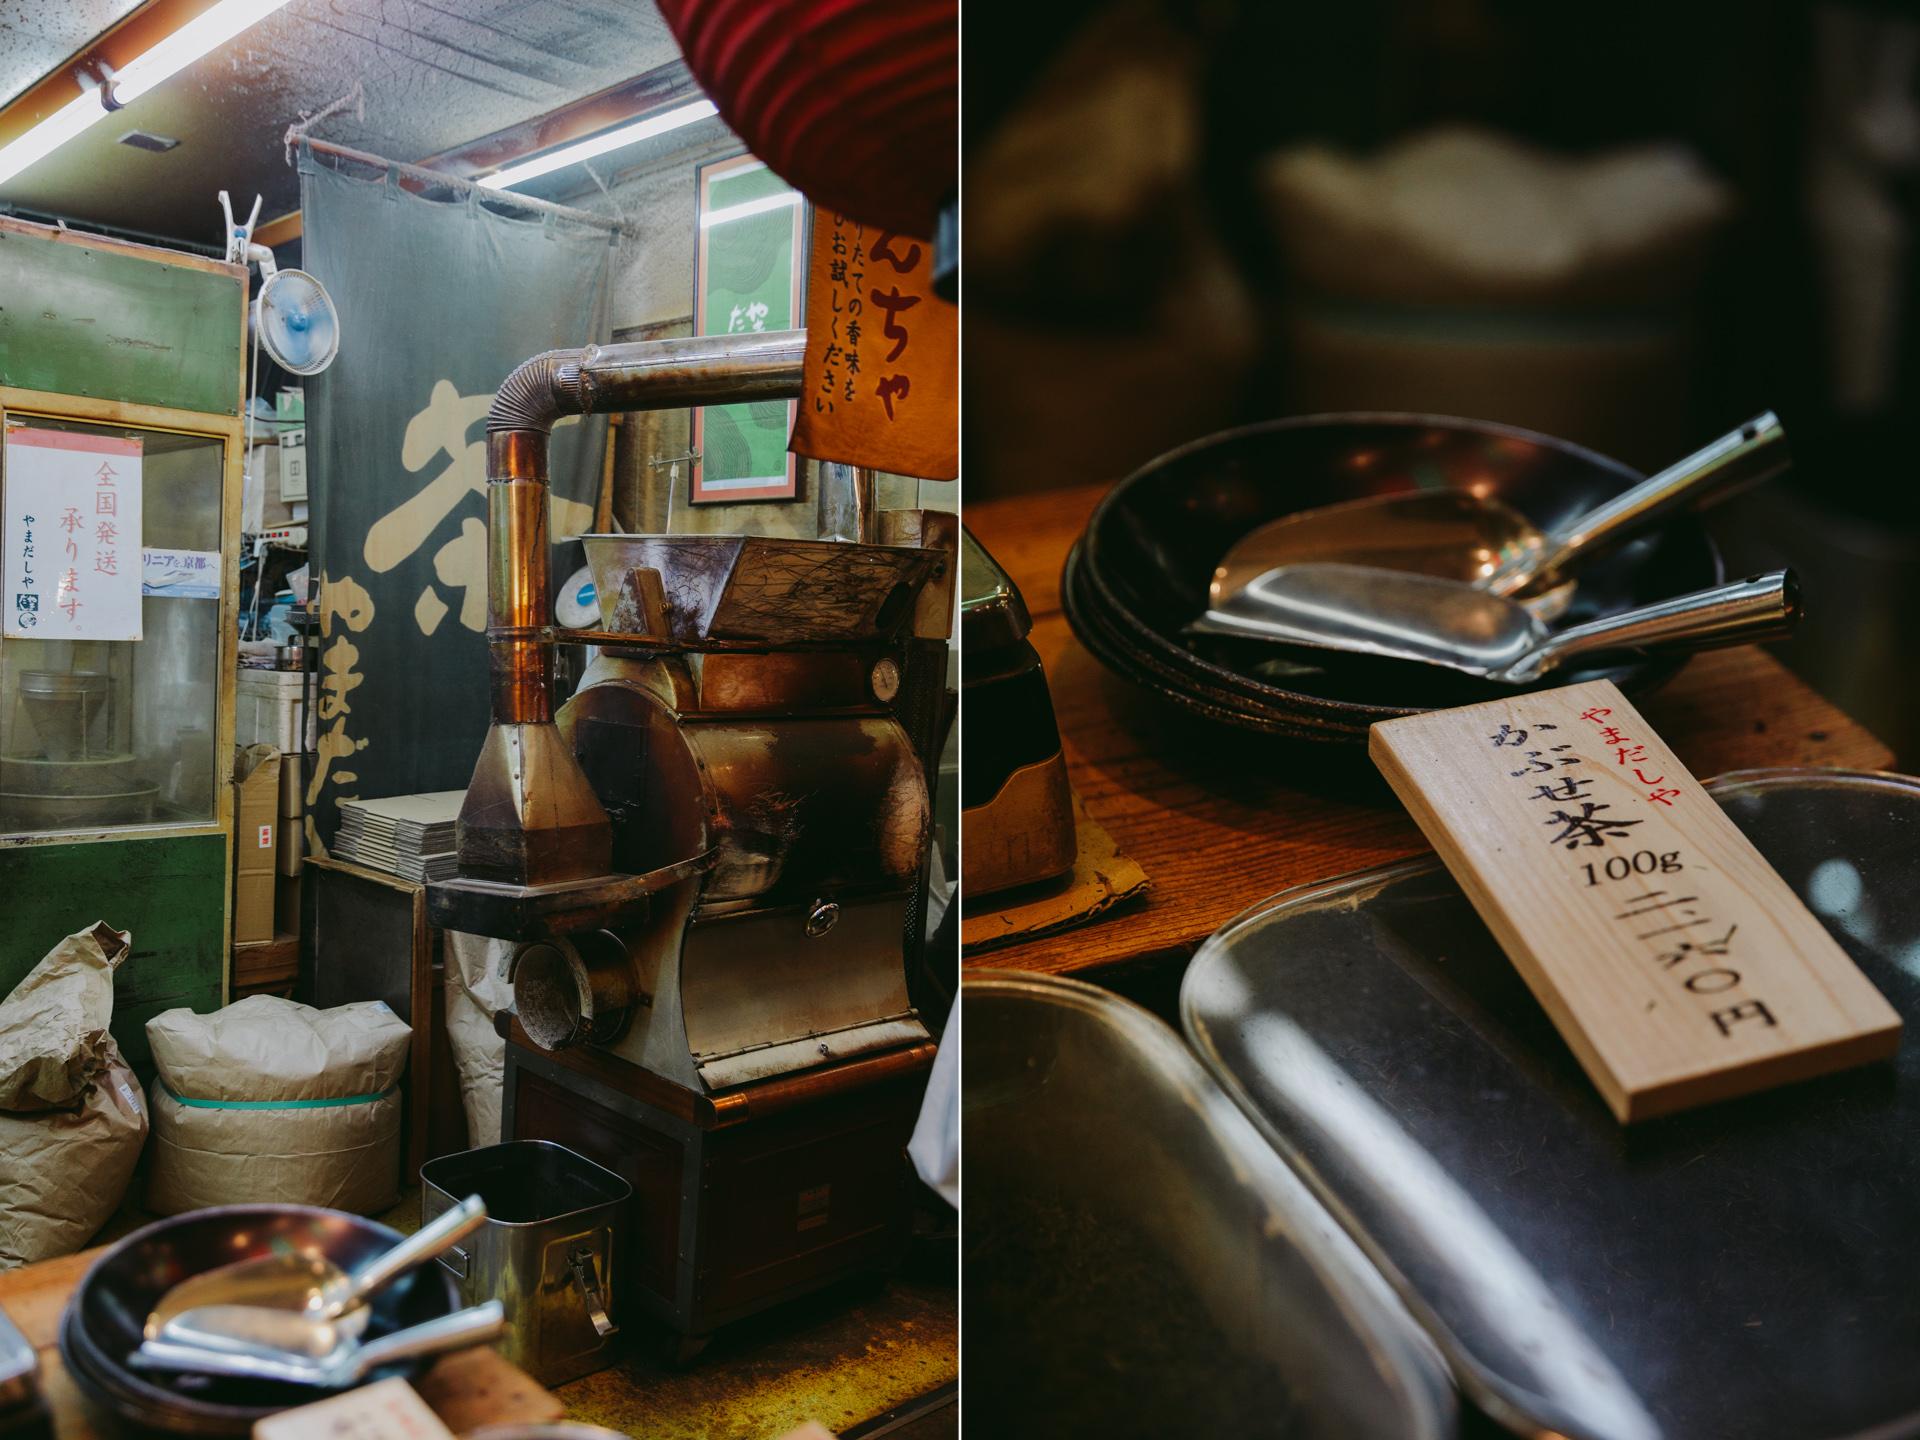 MikeSeehagel-commercial-lifestyle-travel-photography-Japan-V06.jpg